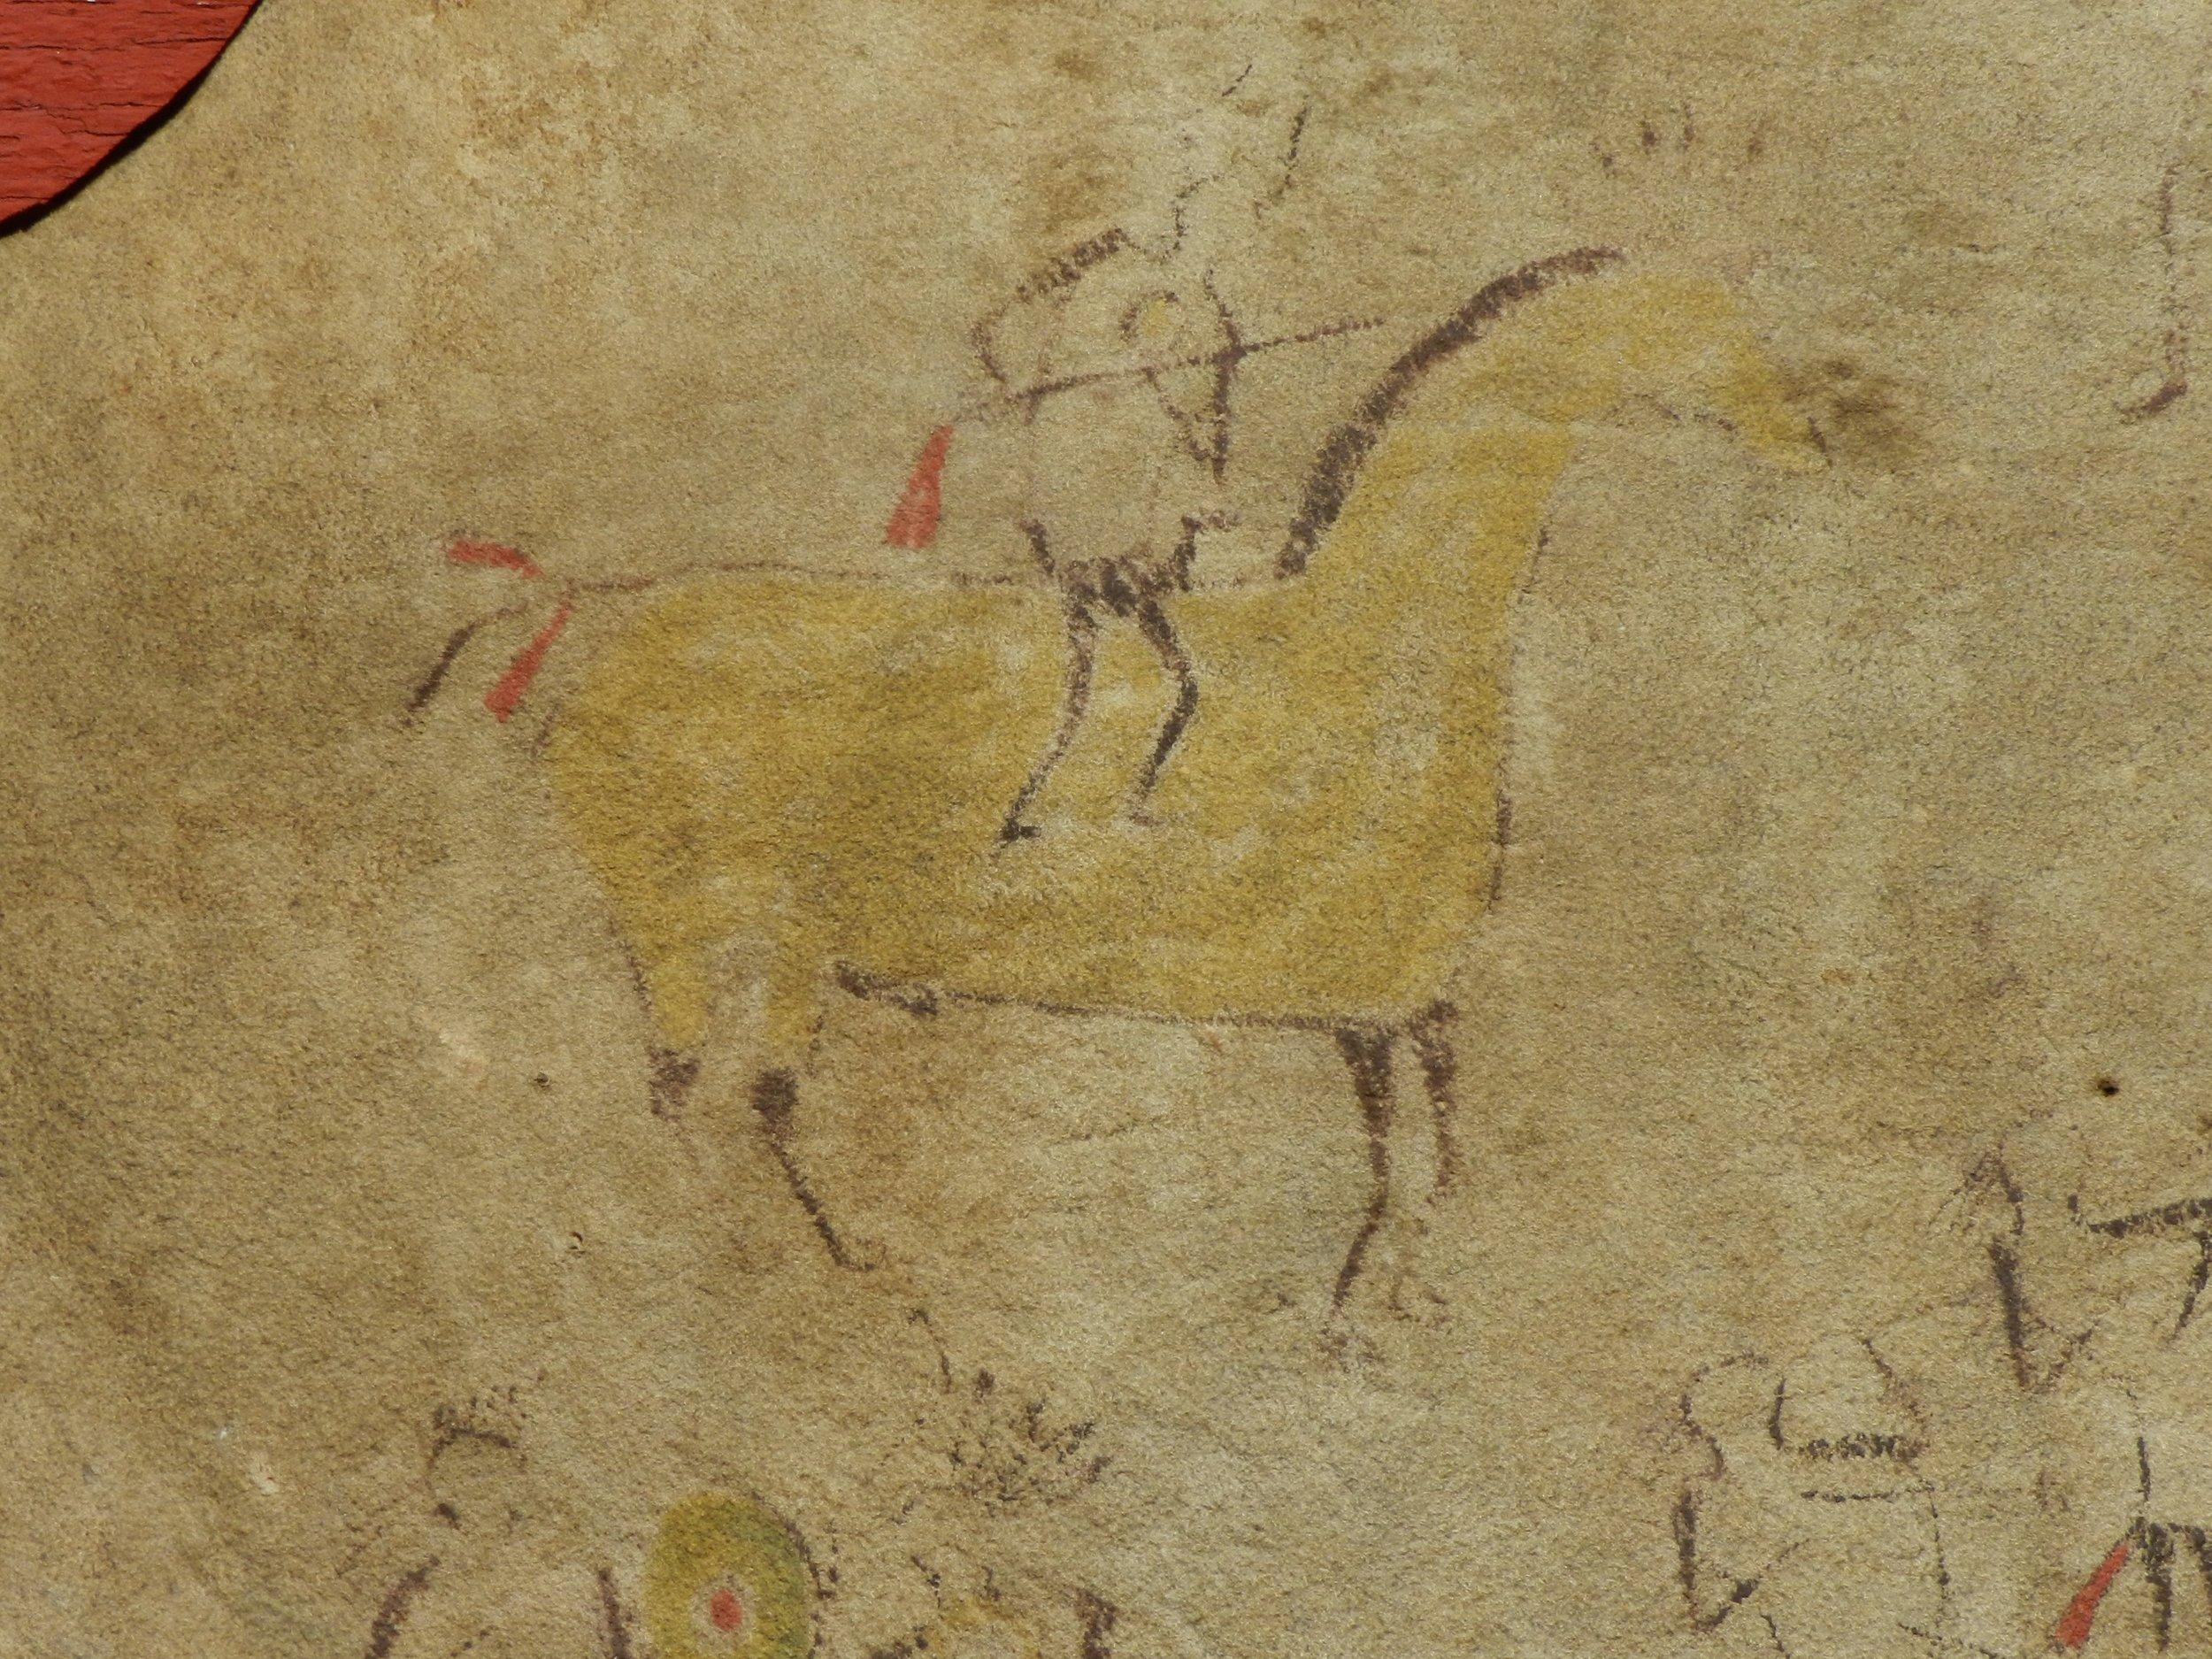 Horse with war bonnet on head